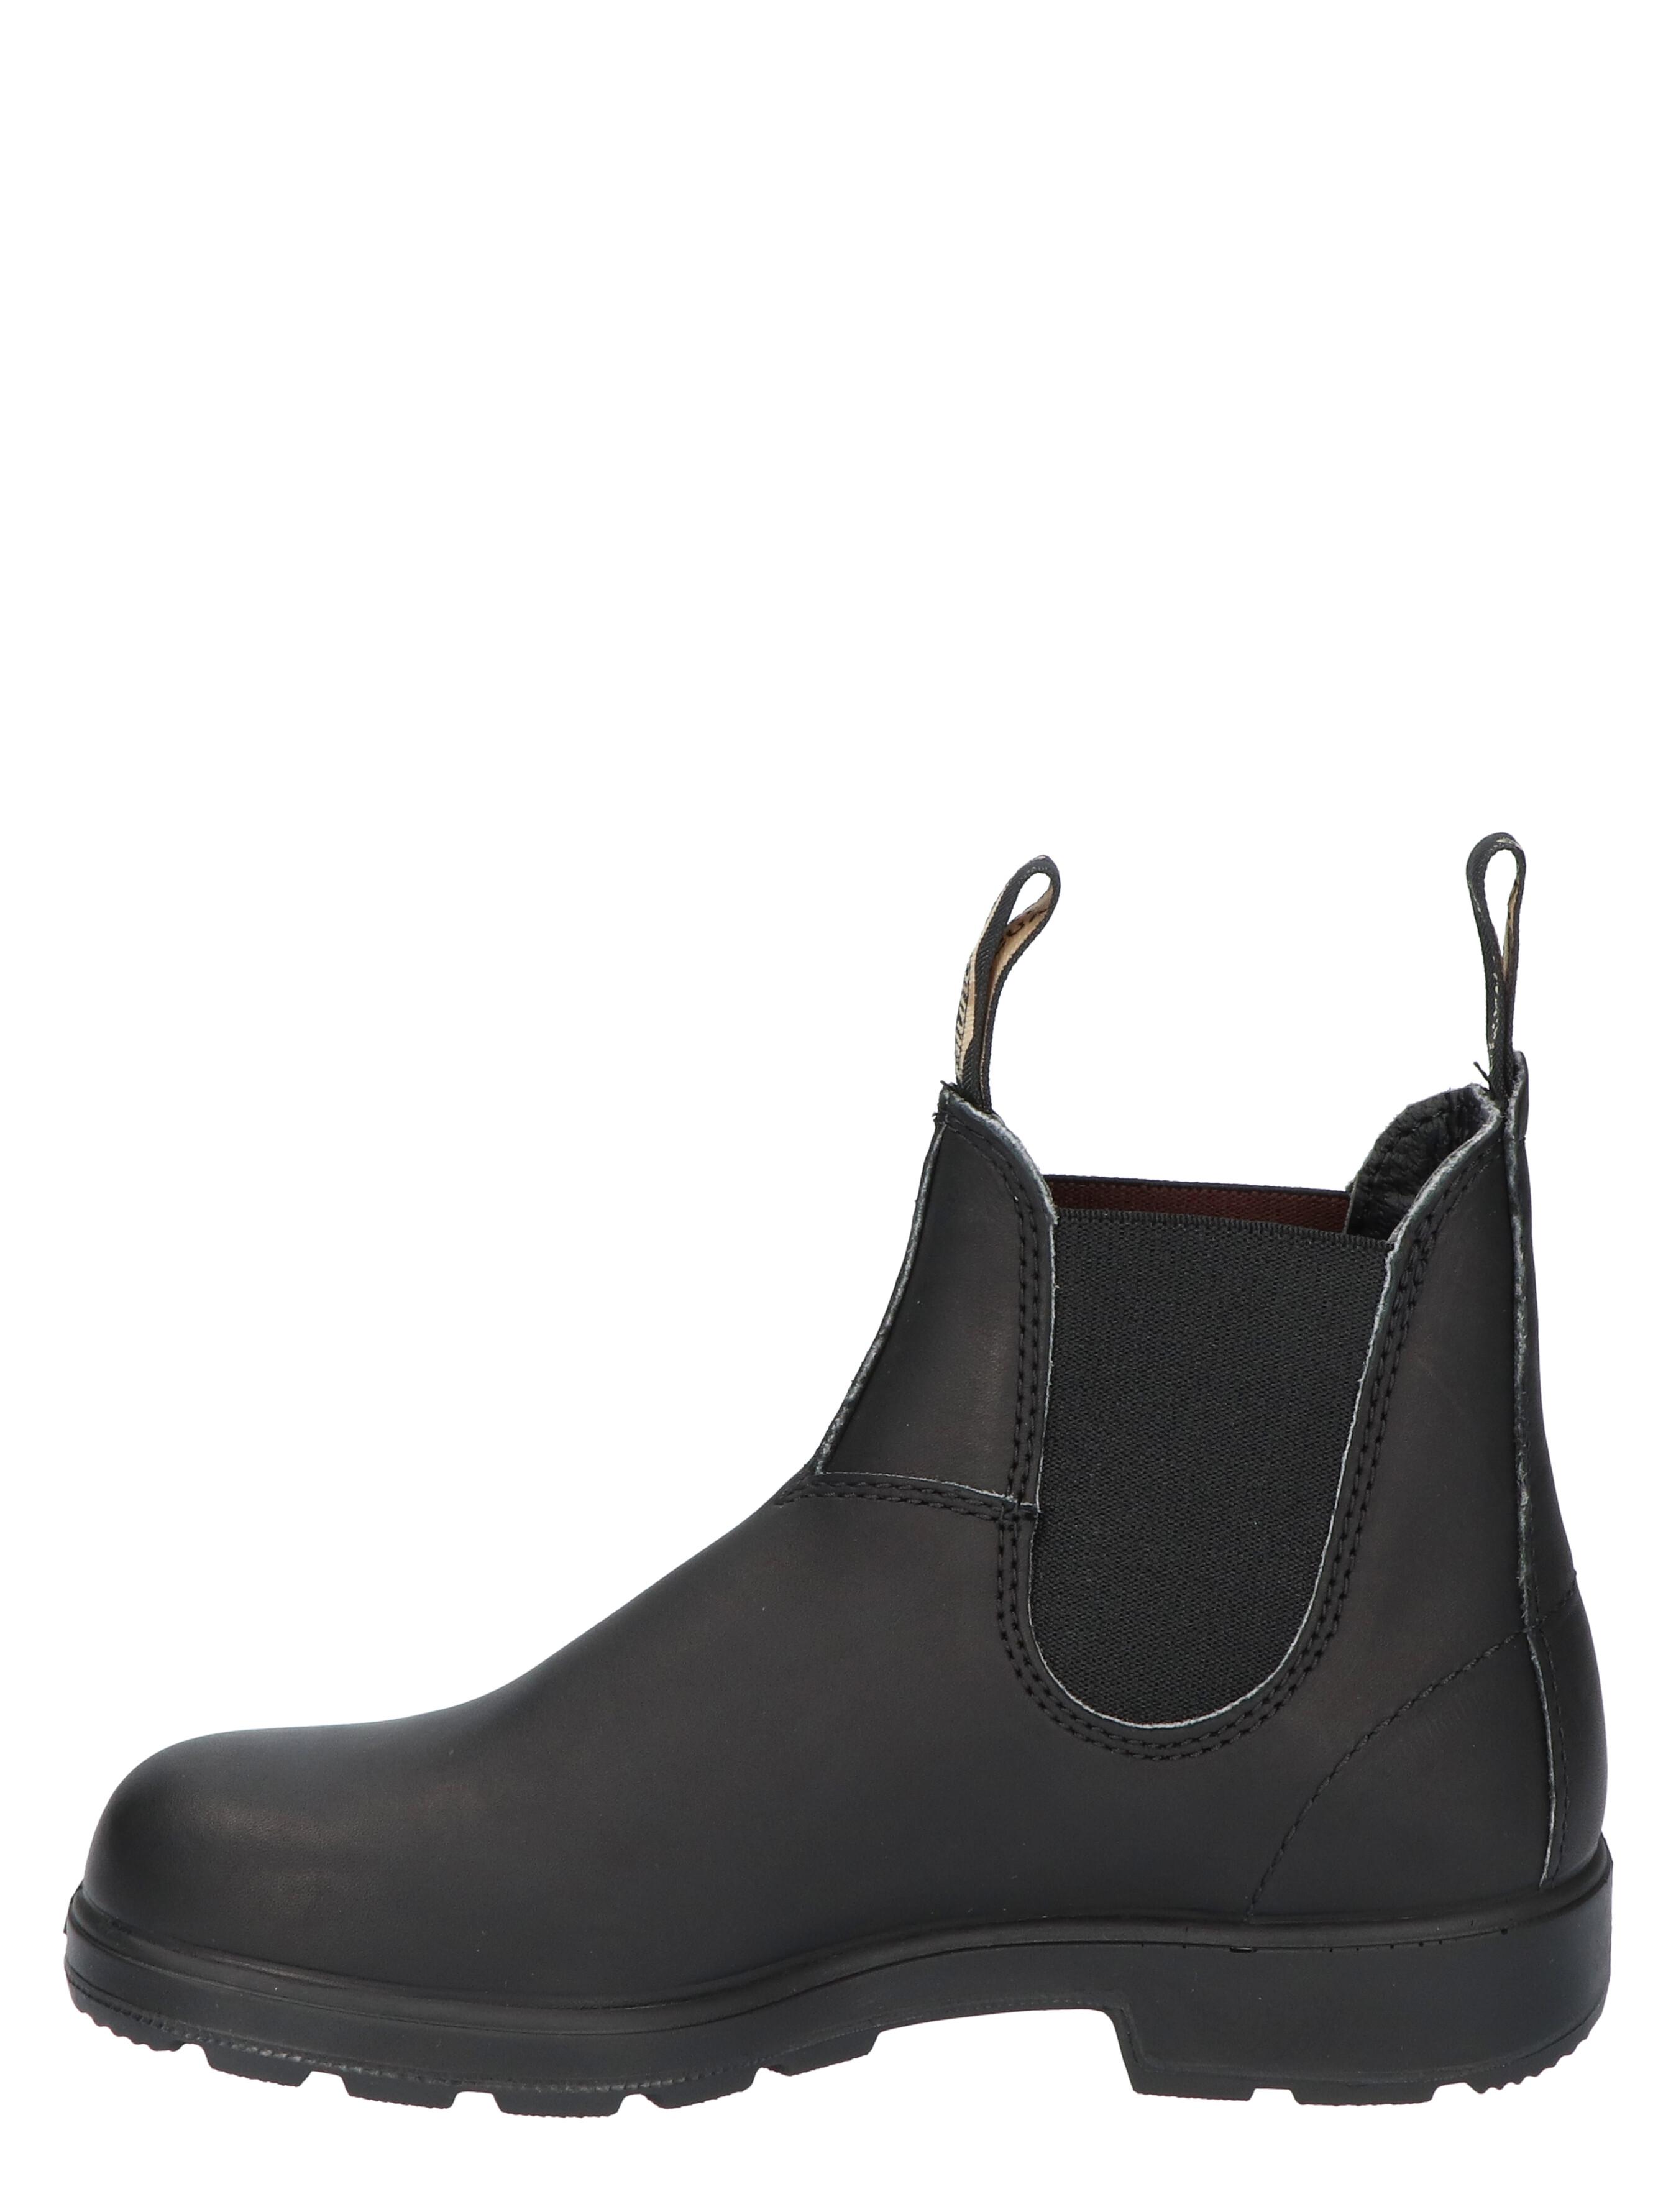 Blundstone 07-510 Black Boots